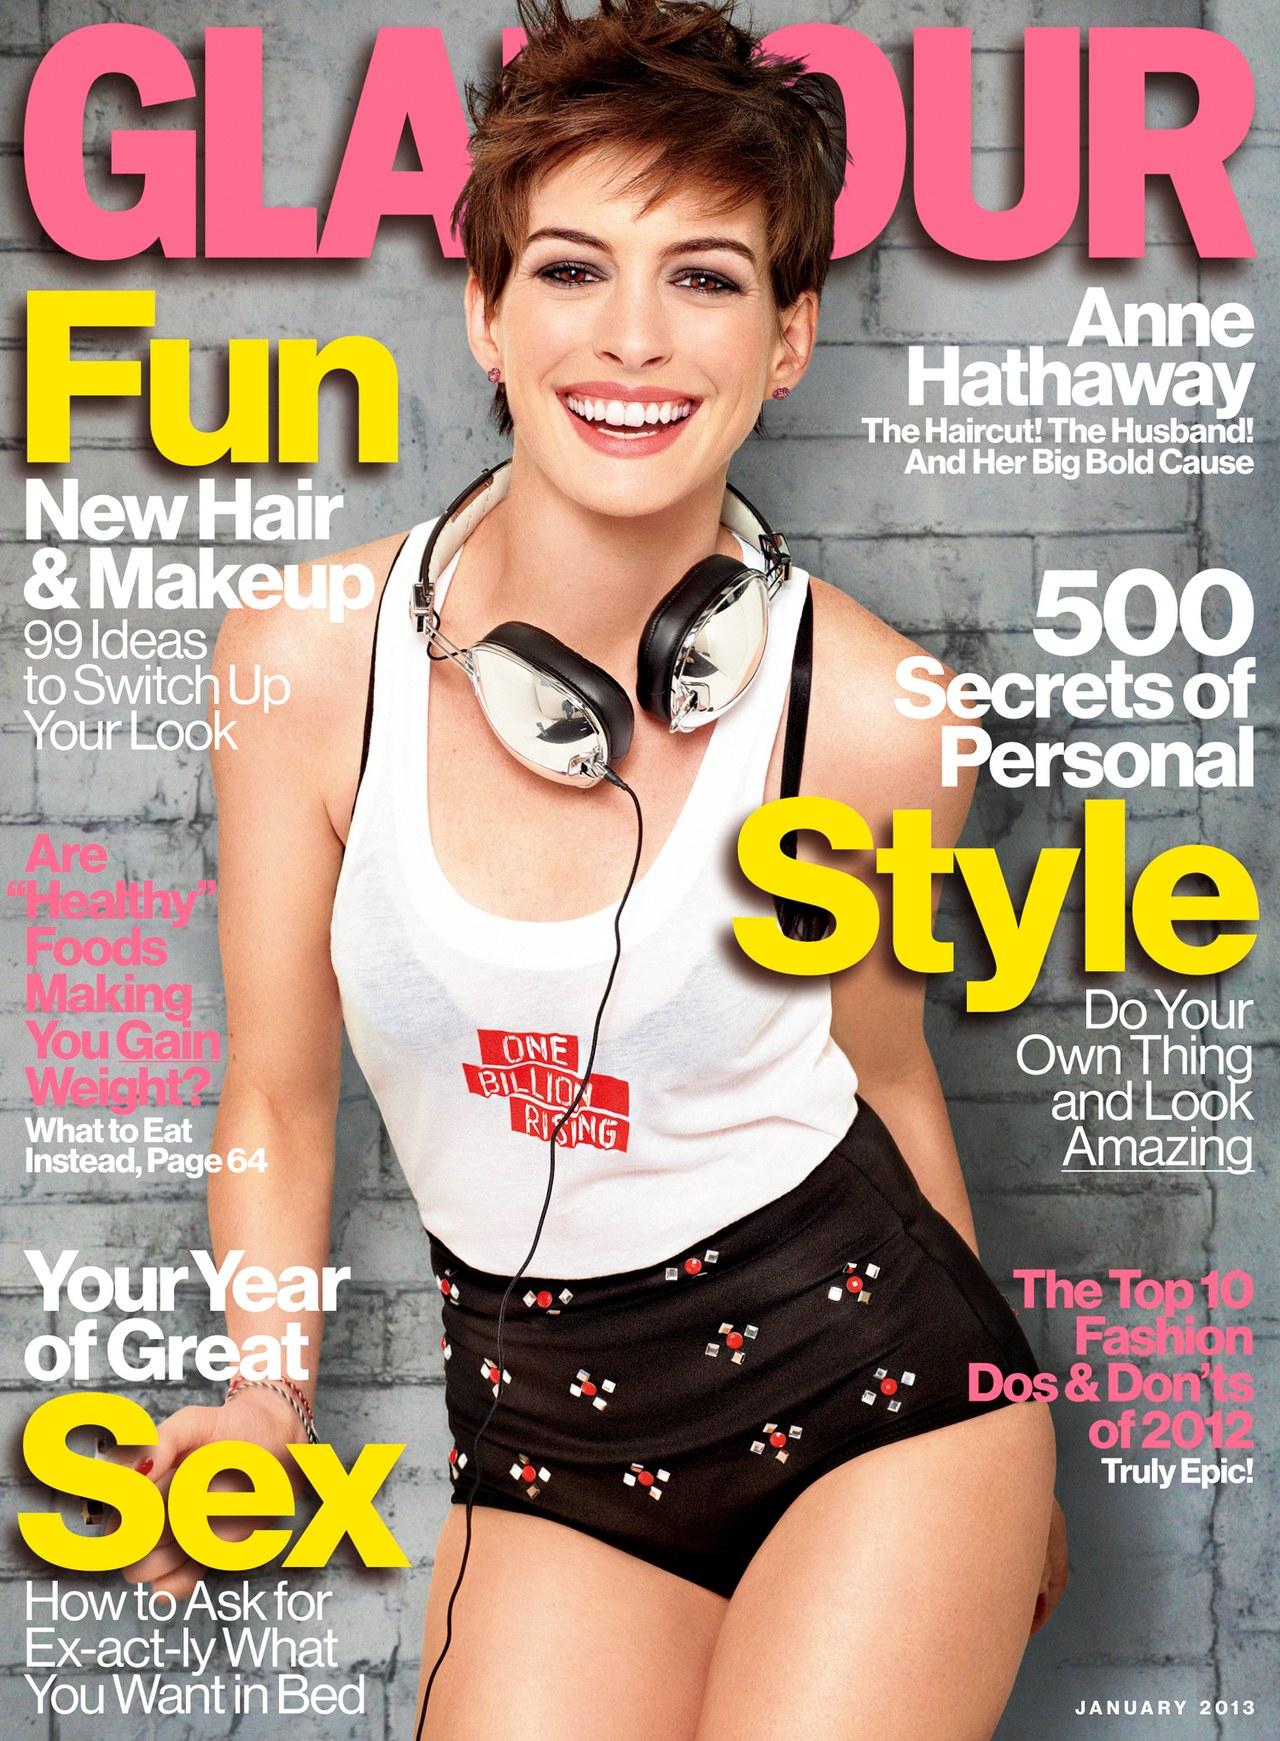 fashion-2012-12-january-glamour-cover-main.jpg